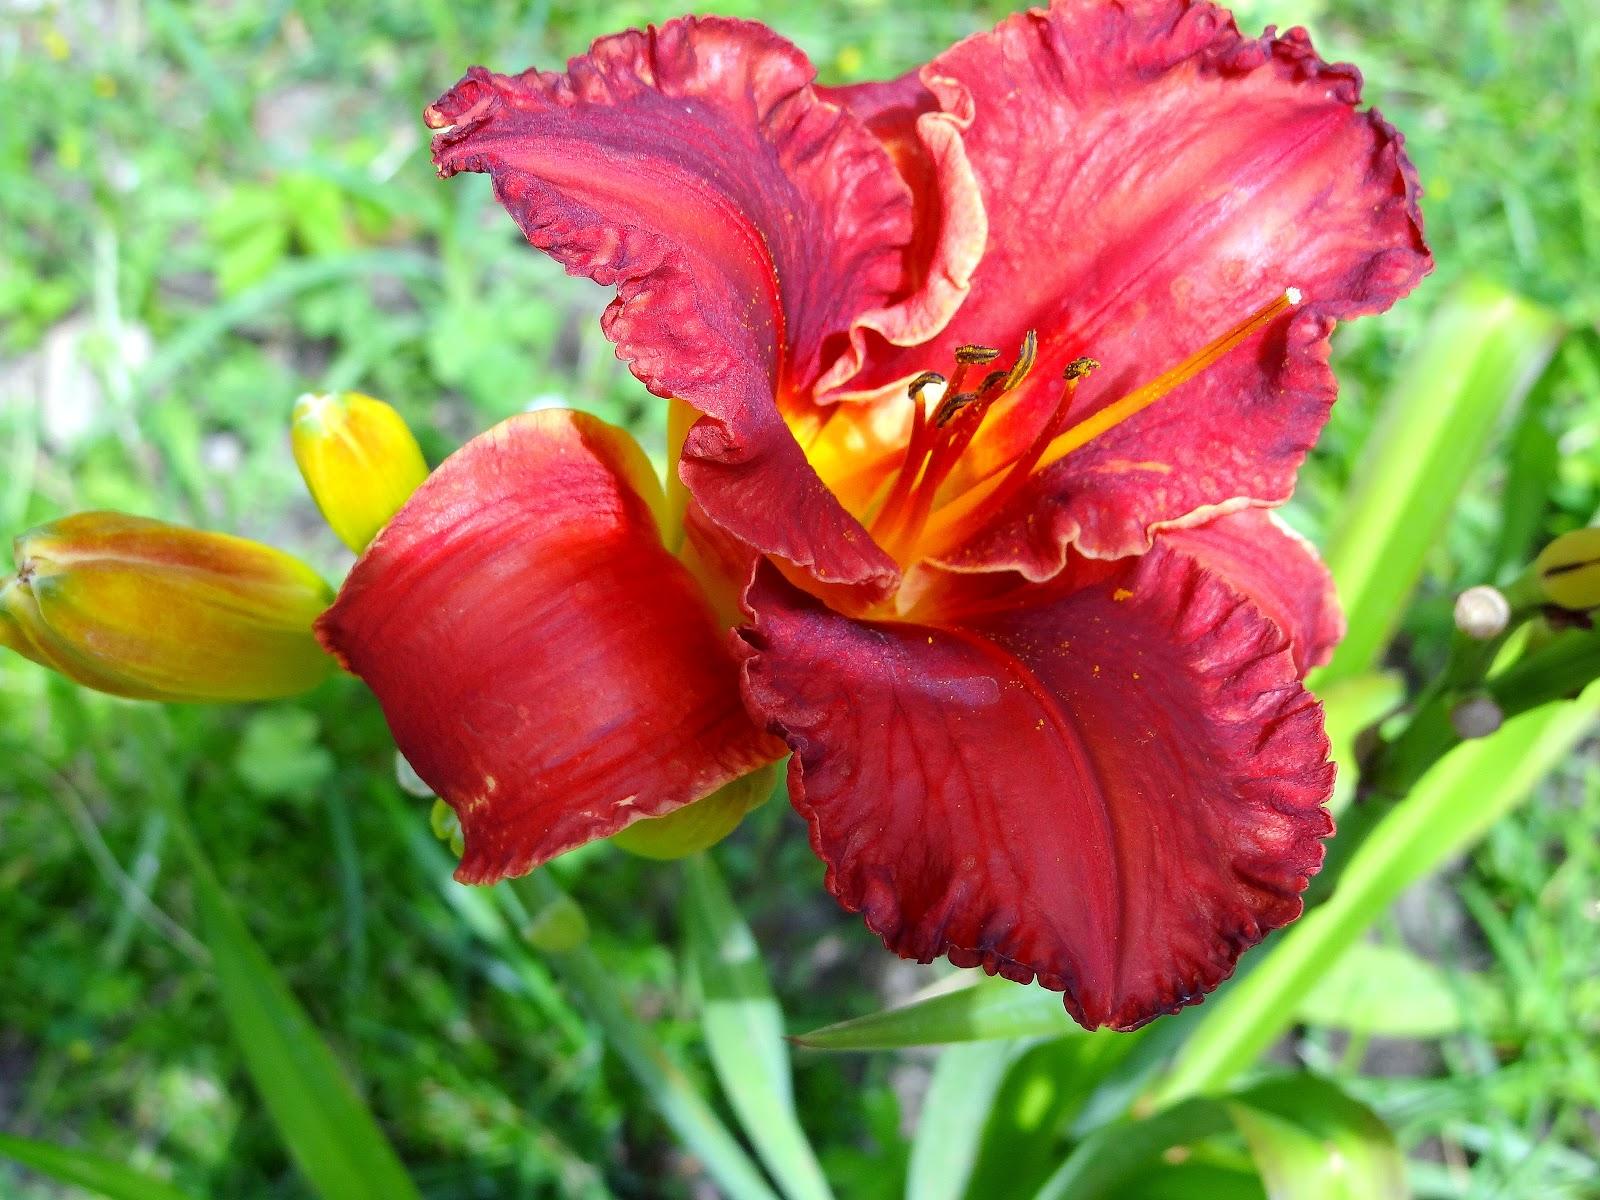 So Yardtistic: How to Plant BULBS like Hostas Daylillies and Iris Bulbs